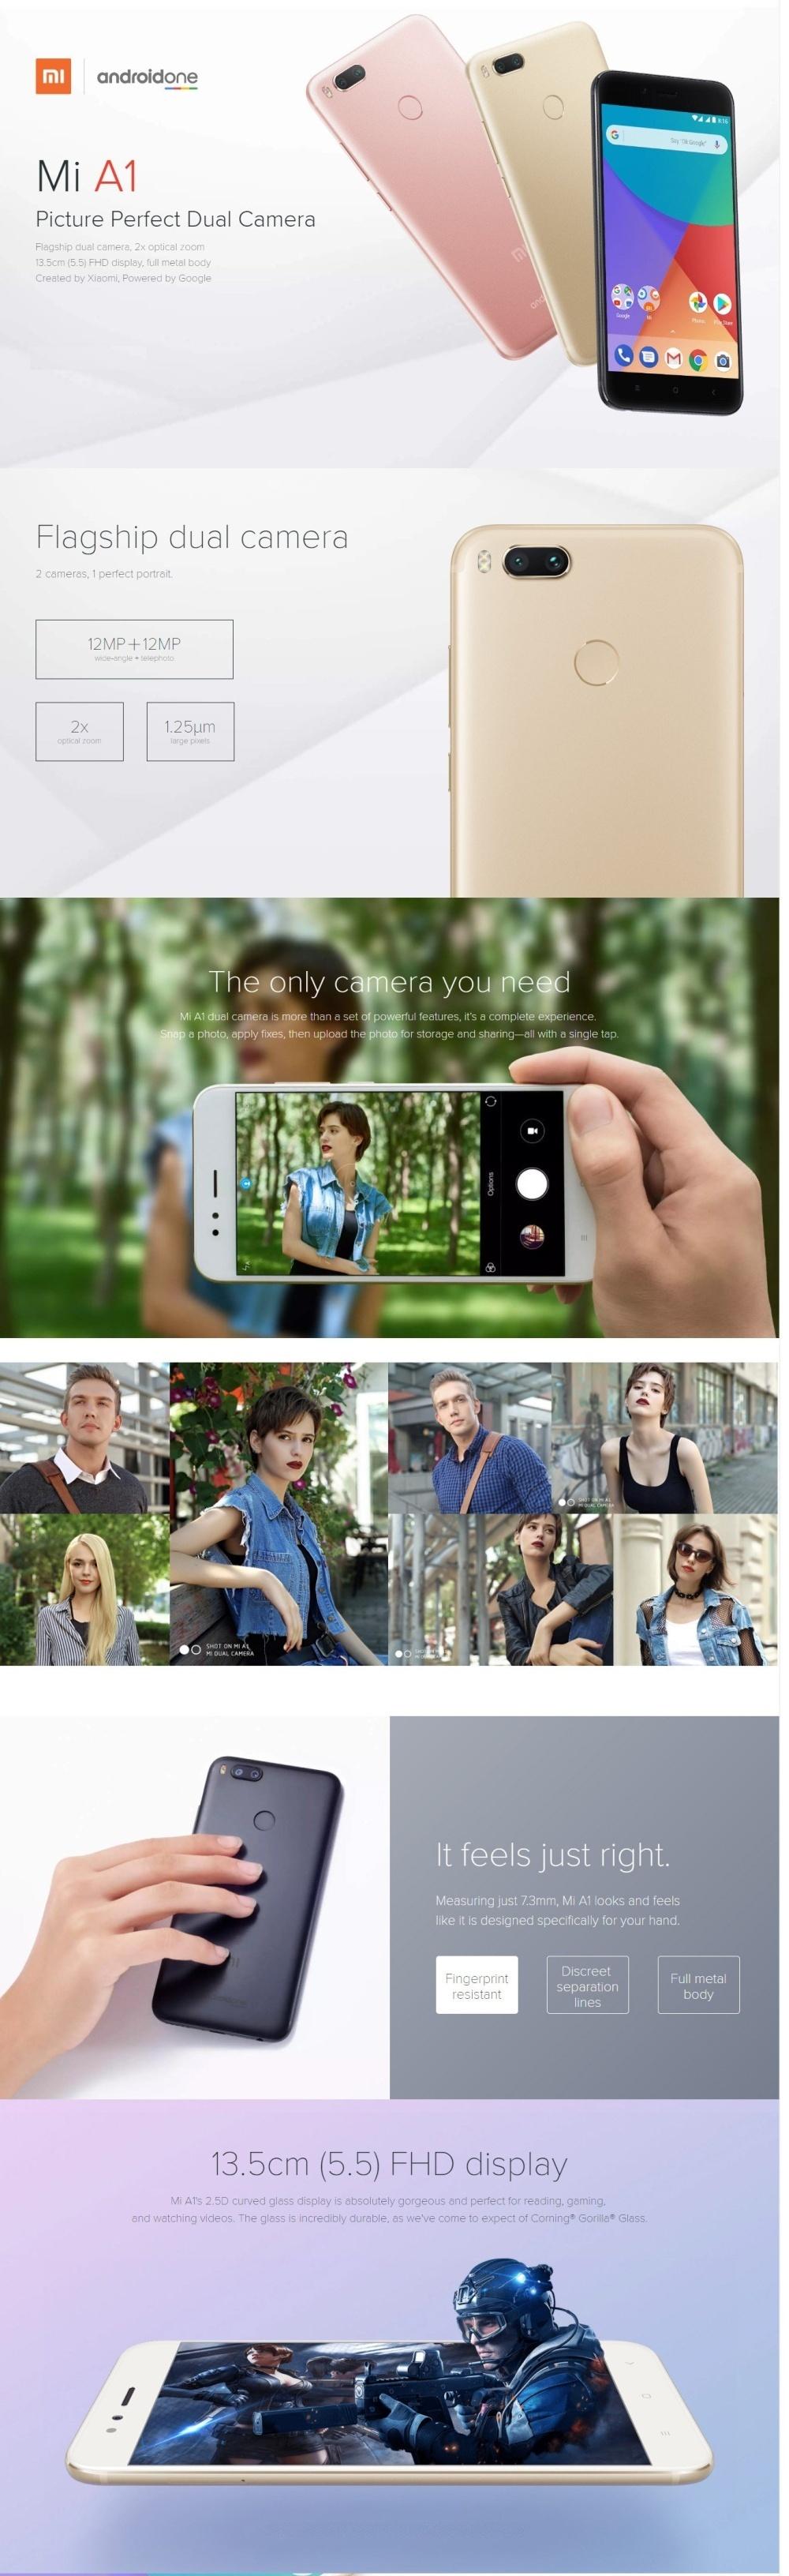 Harga Xiaomi Redmi Note 4x 4gb 64gb Garansi Distributor 1 Update Tahun A1 4g Ram Black Rely